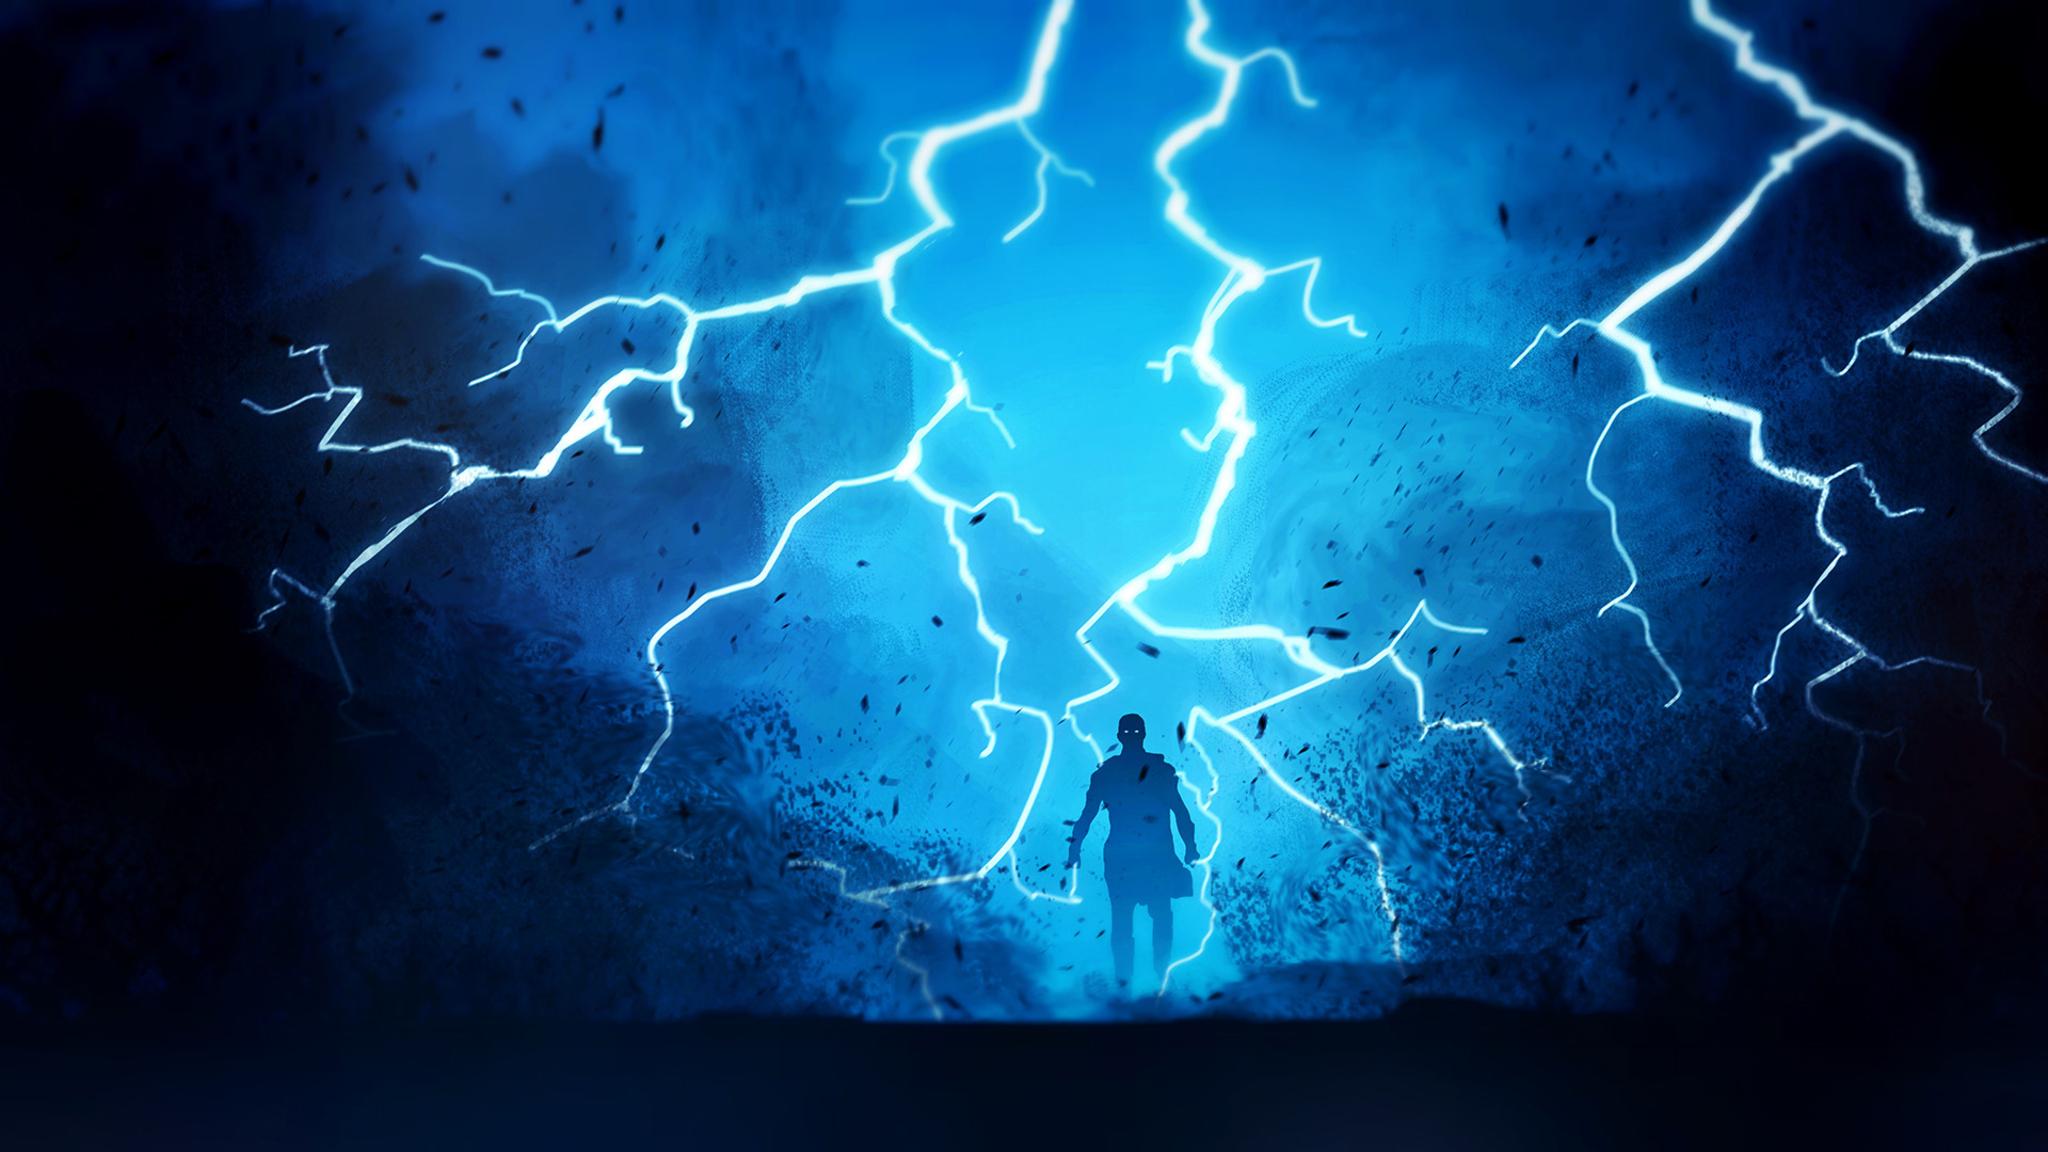 2048x1152 warrior fantasy lightning 2048x1152 resolution hd 4k wallpapers images backgrounds - Lightning wallpaper 4k ...